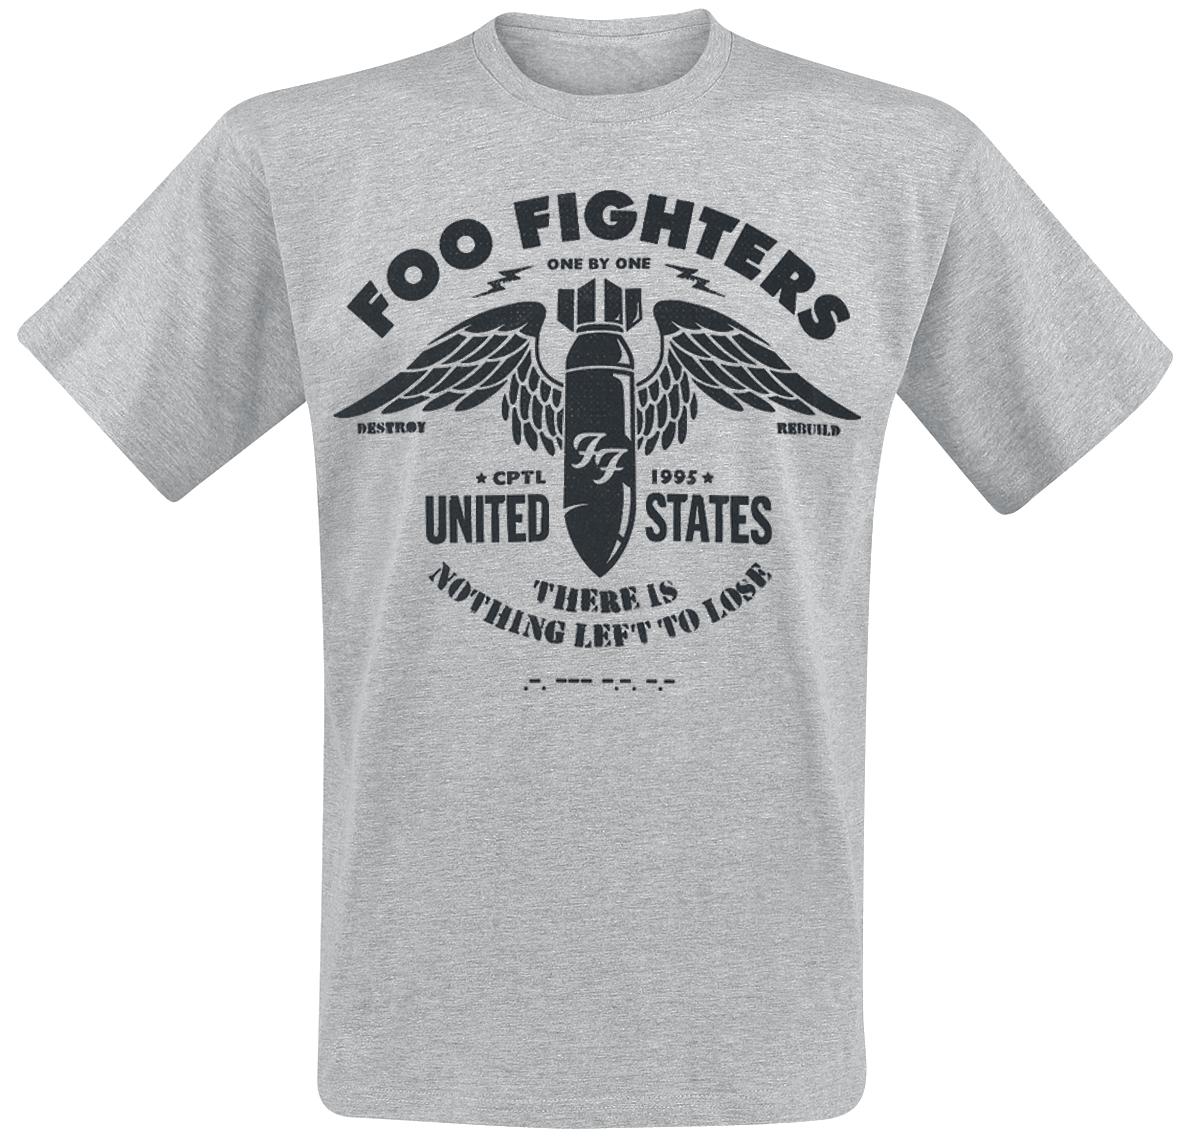 Foo Fighters - Stencil - T-Shirt - mottled light grey image